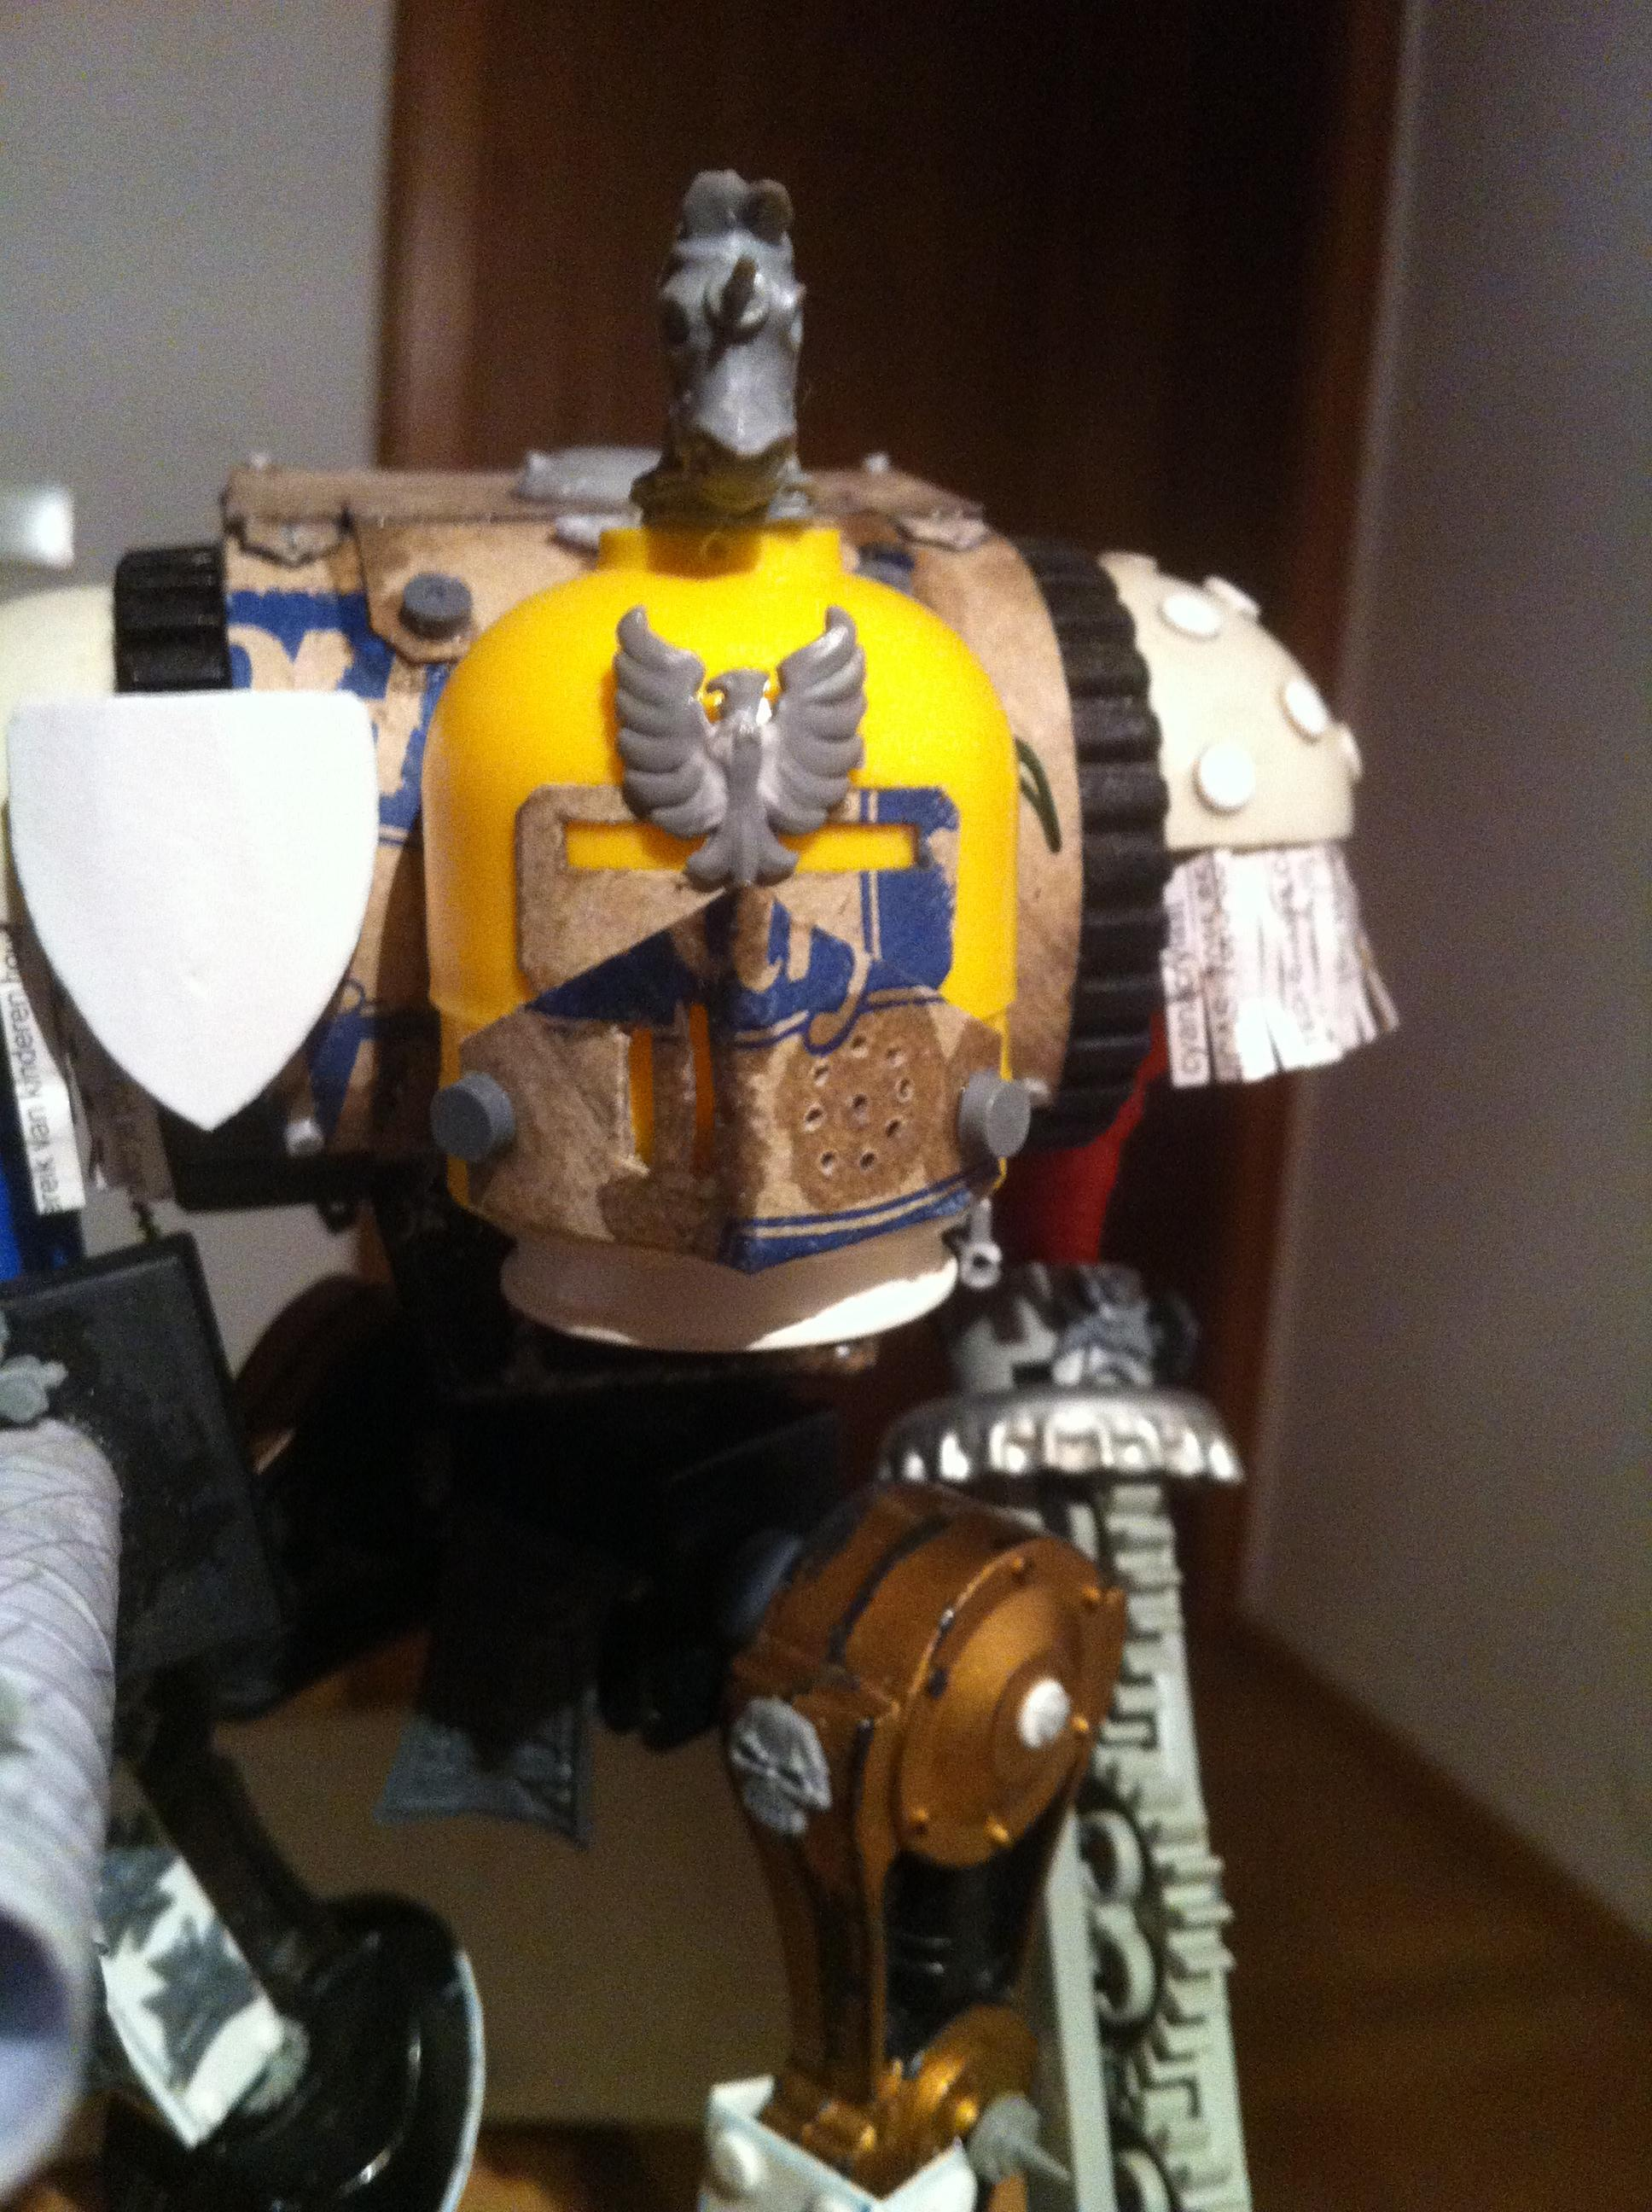 Adeptus, Build, Egg, Imperial, Knights, Scratch Build, Surprise, Titanicus, Trash, Walker, Warhammer 40,000